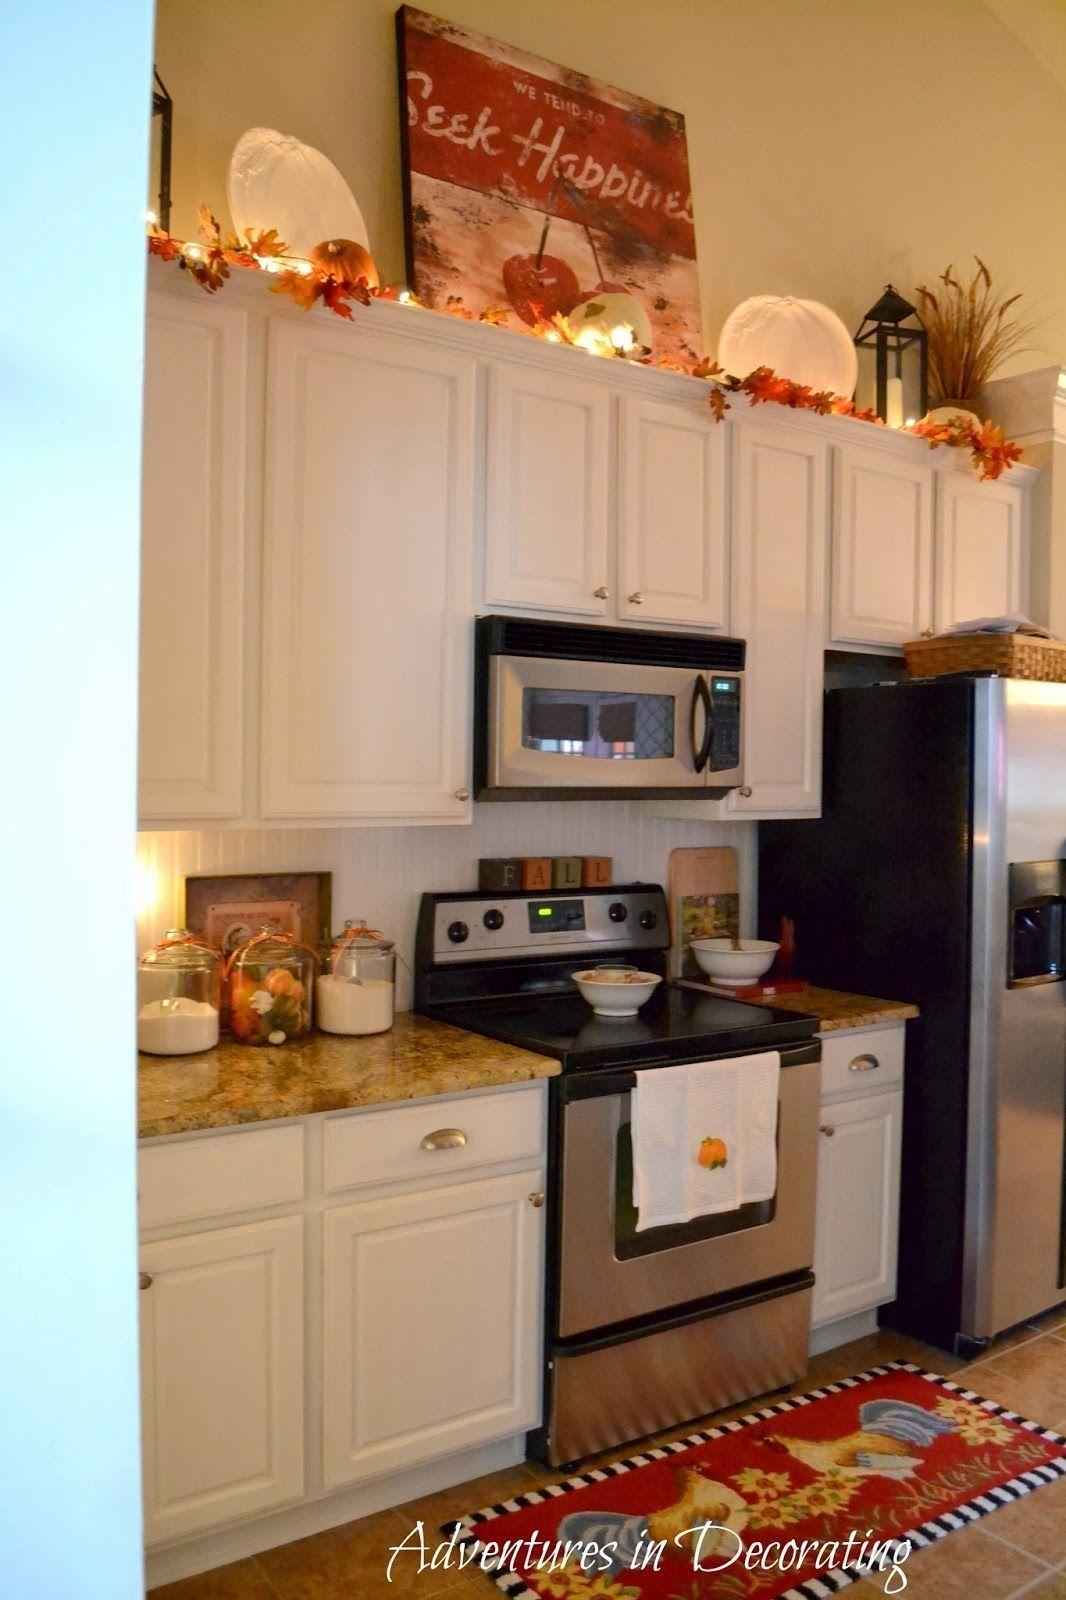 20+ Creative Fall Kitchen Design Ideas For Home Decor